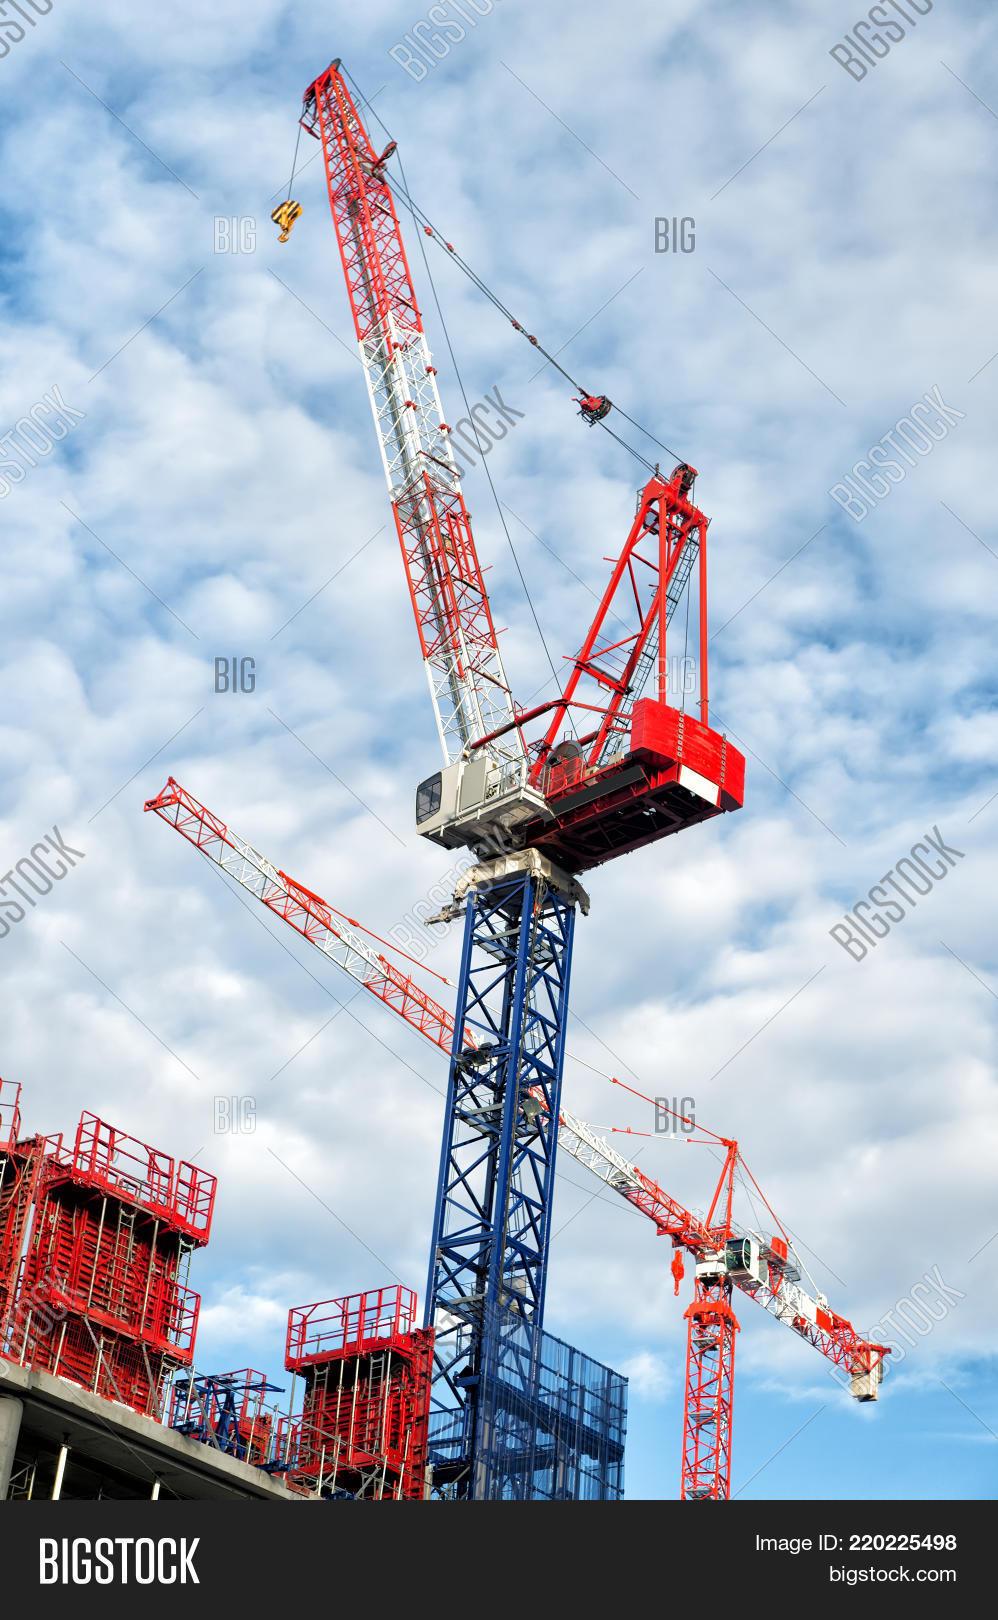 Construction Cranes On Image & Photo (Free Trial) | Bigstock